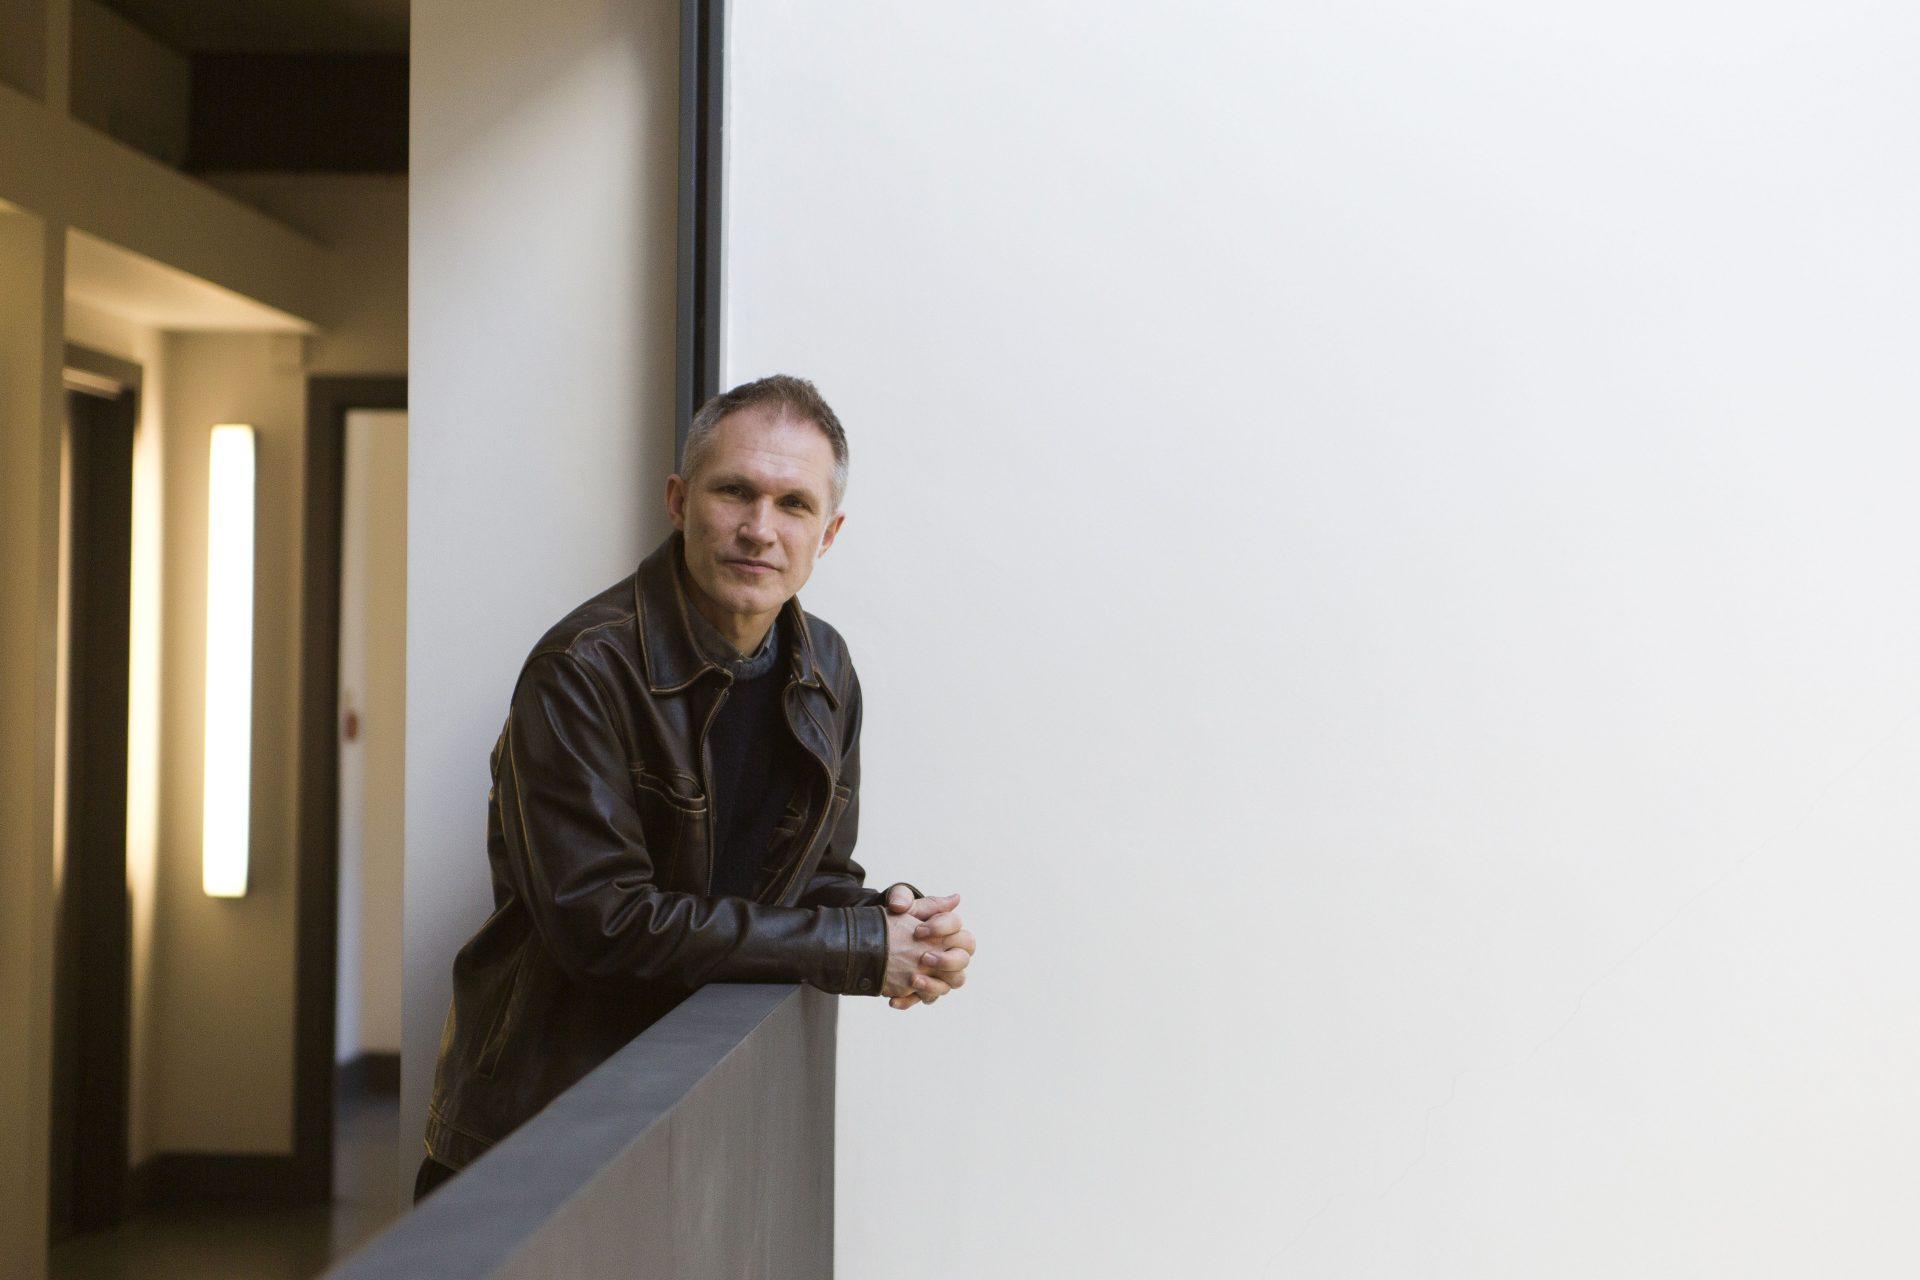 Murray Smith, University of Kent by Rob Greshoff